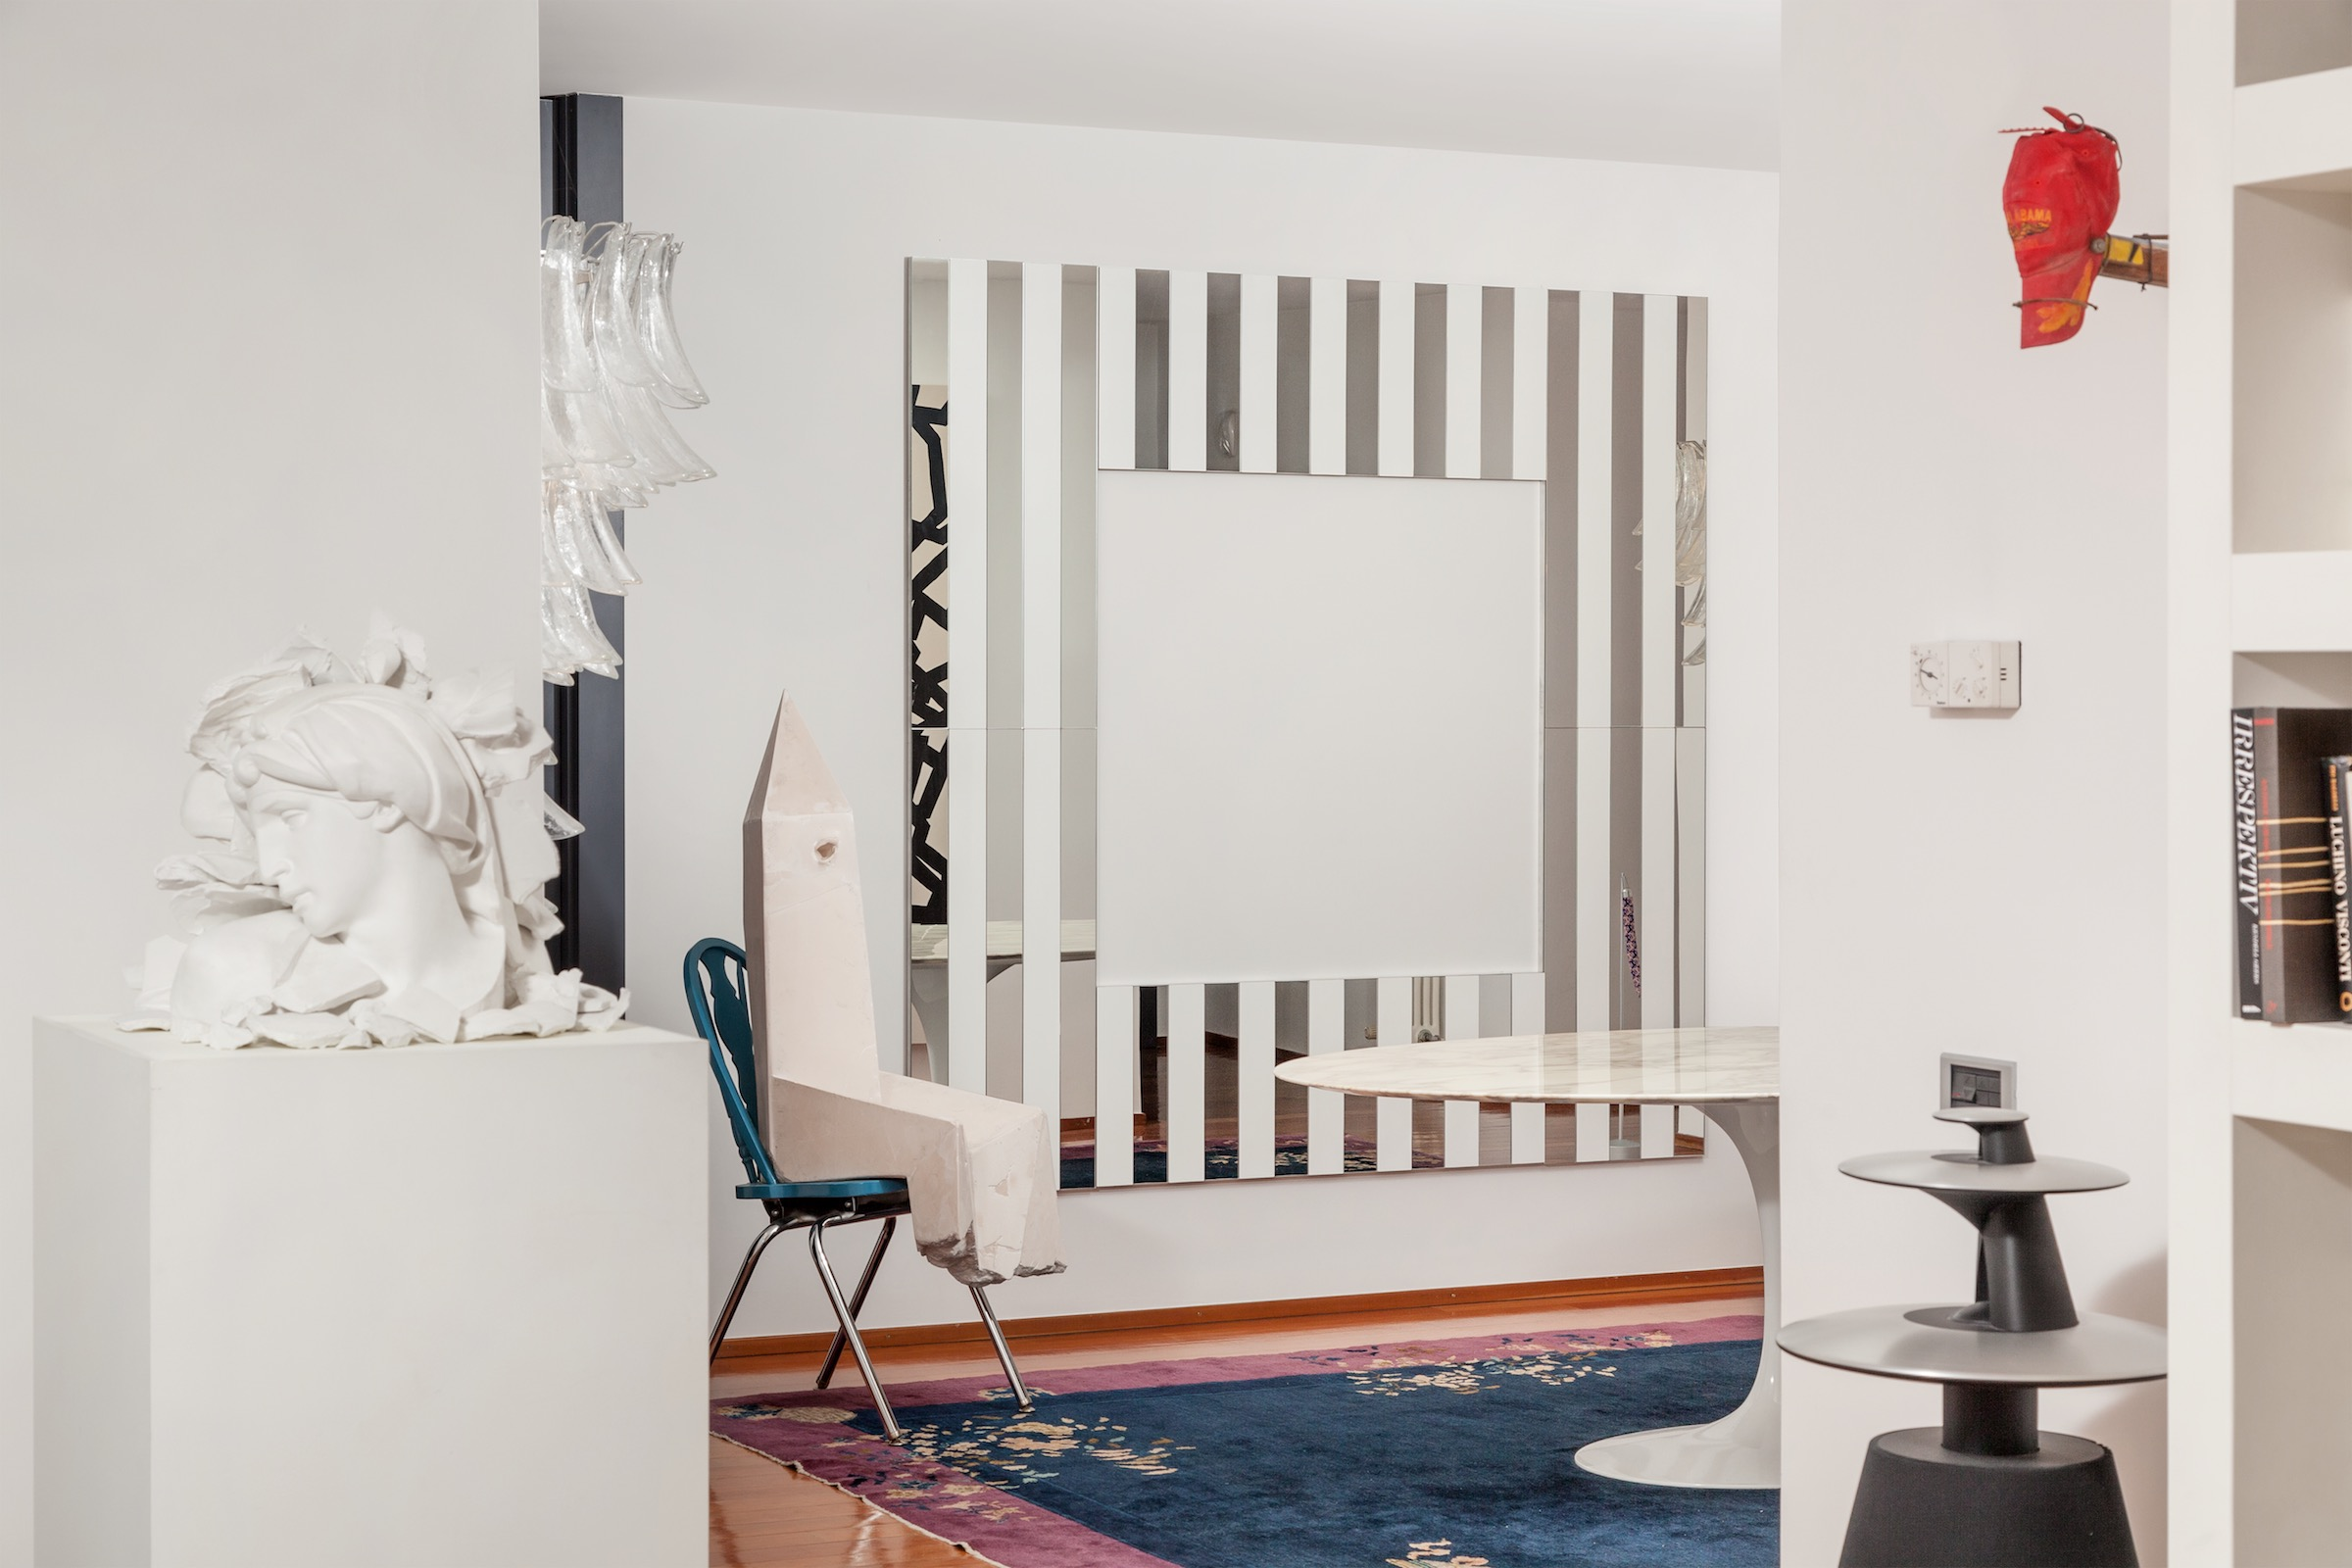 An interior filled with art by Giulio Paolini, Mike Nelson, Daniel Buren, and Andra Ursuta. Photo: Pietro Cocco. Courtesy of Mauro De Iorio.